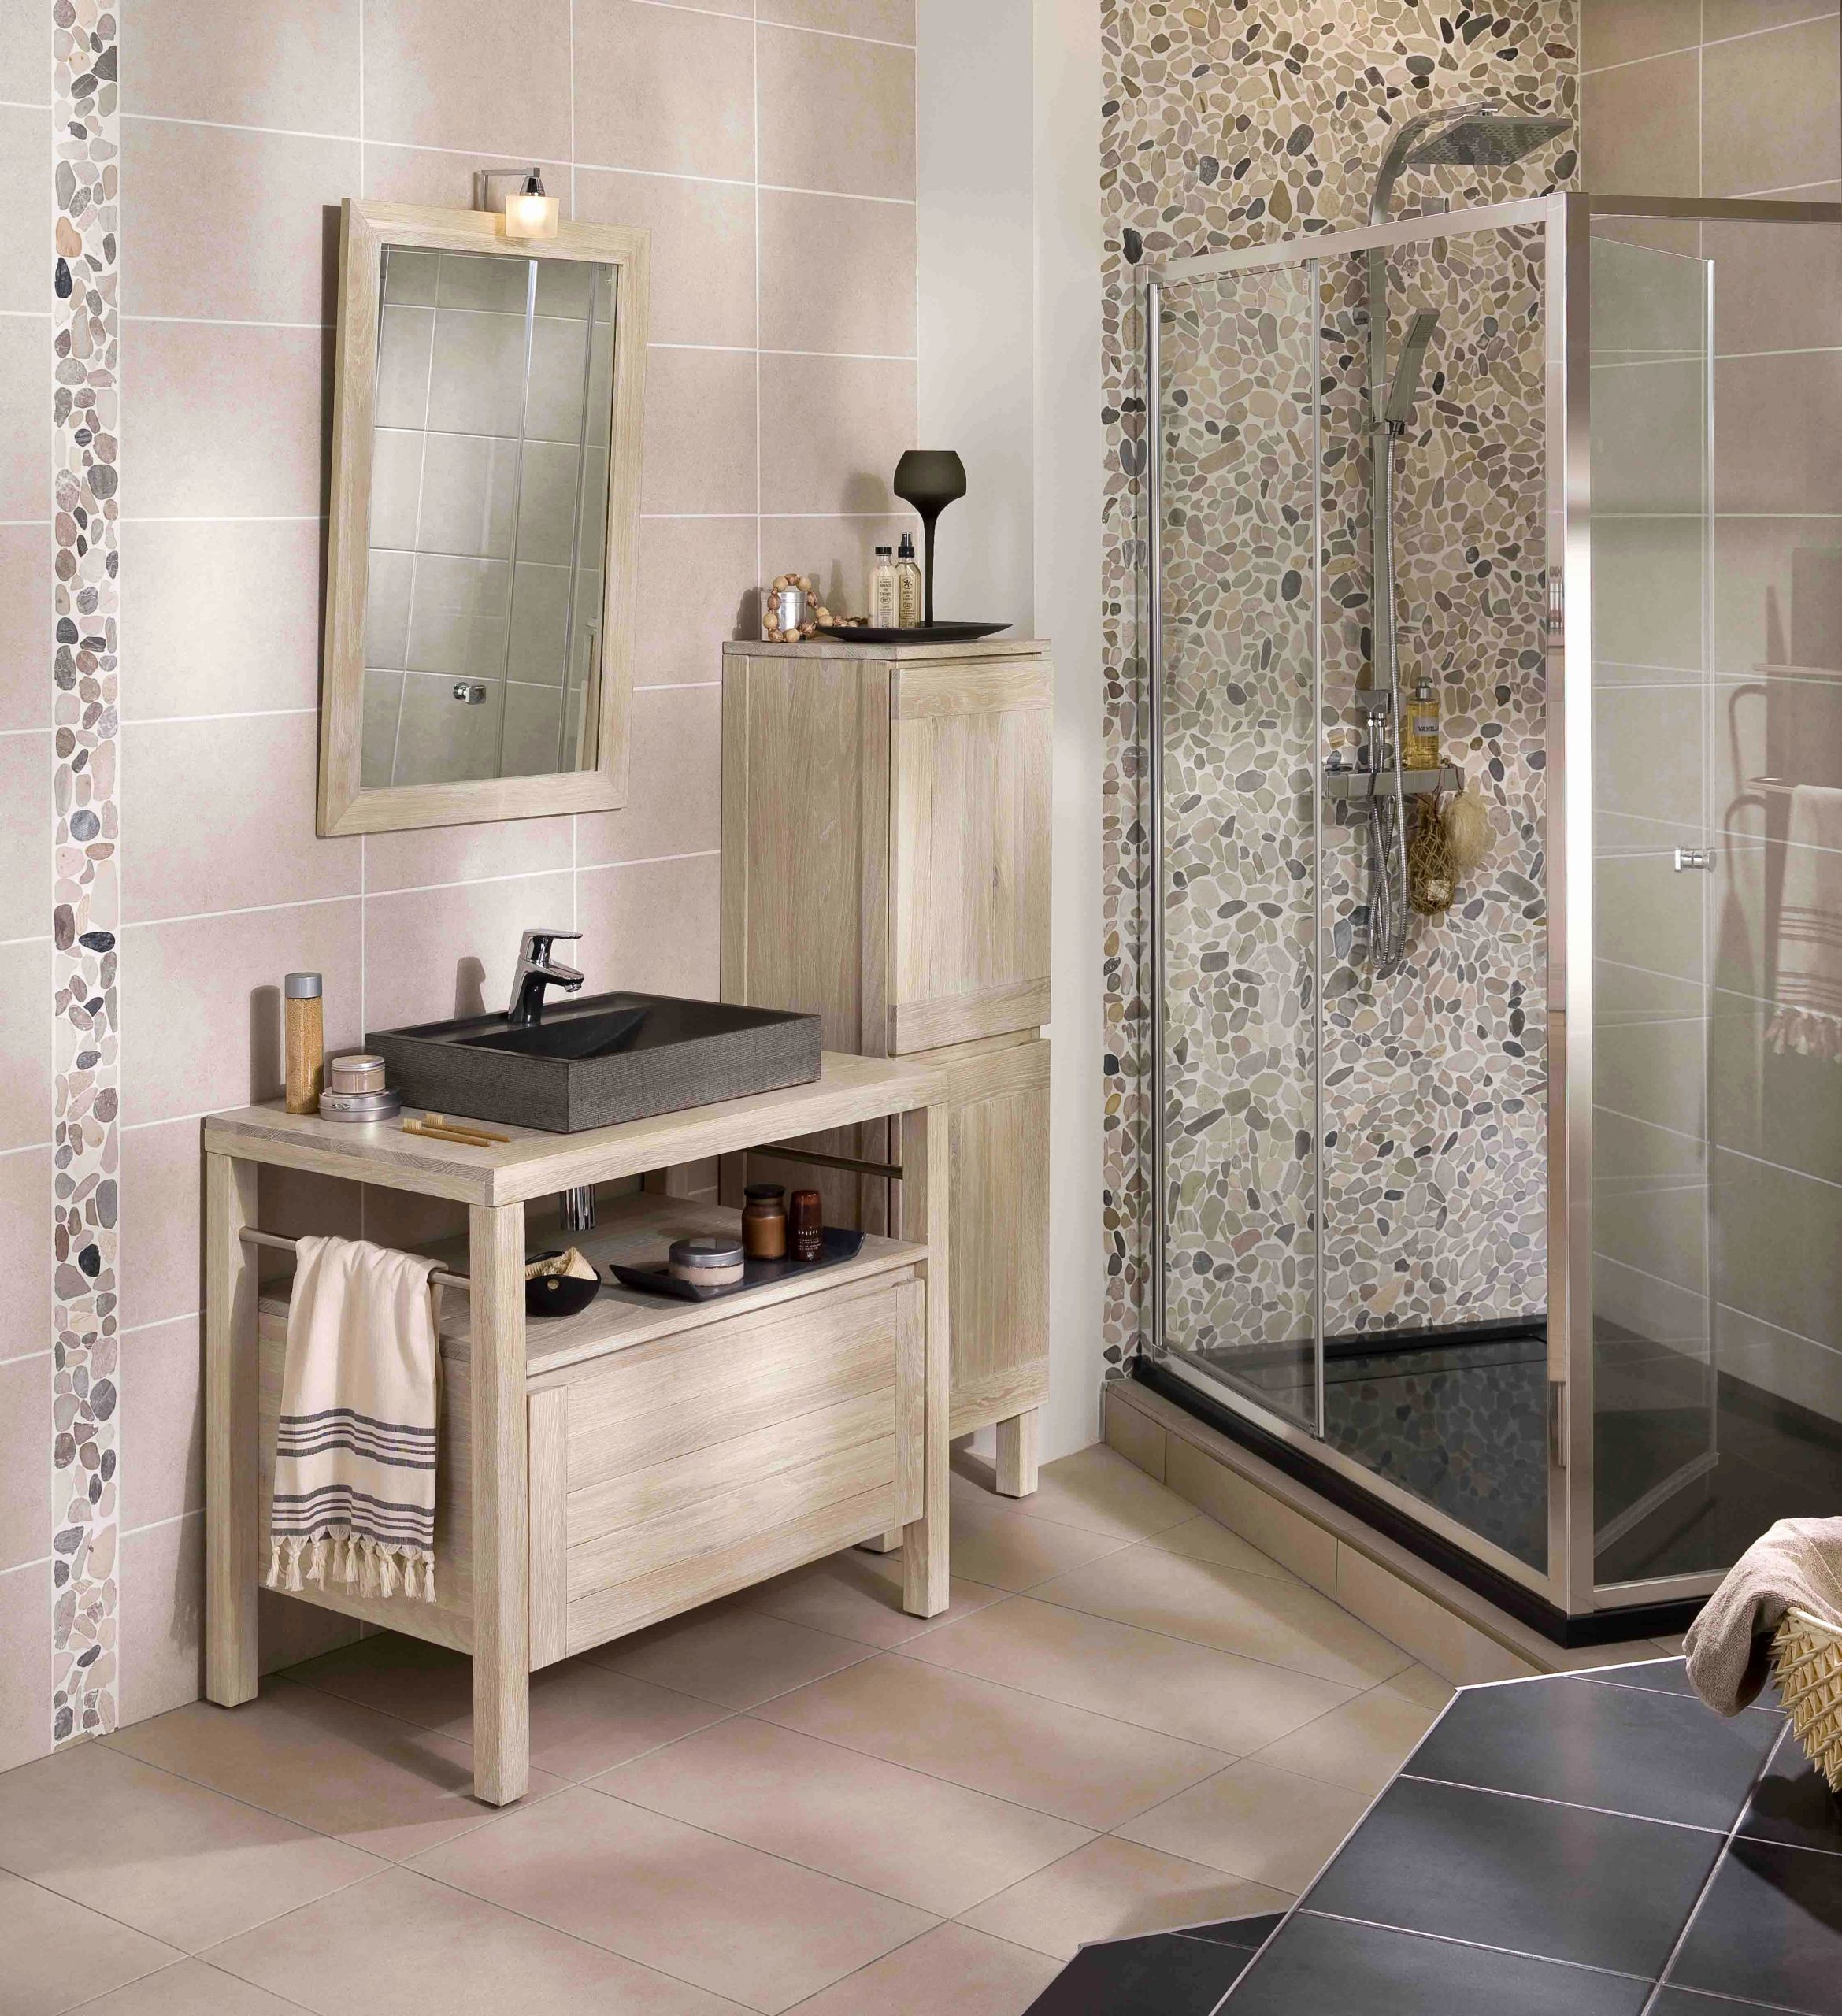 mobilier salle de bain hotellerie beau igreentrip salon de jardin of mobilier salle de bain hotellerie